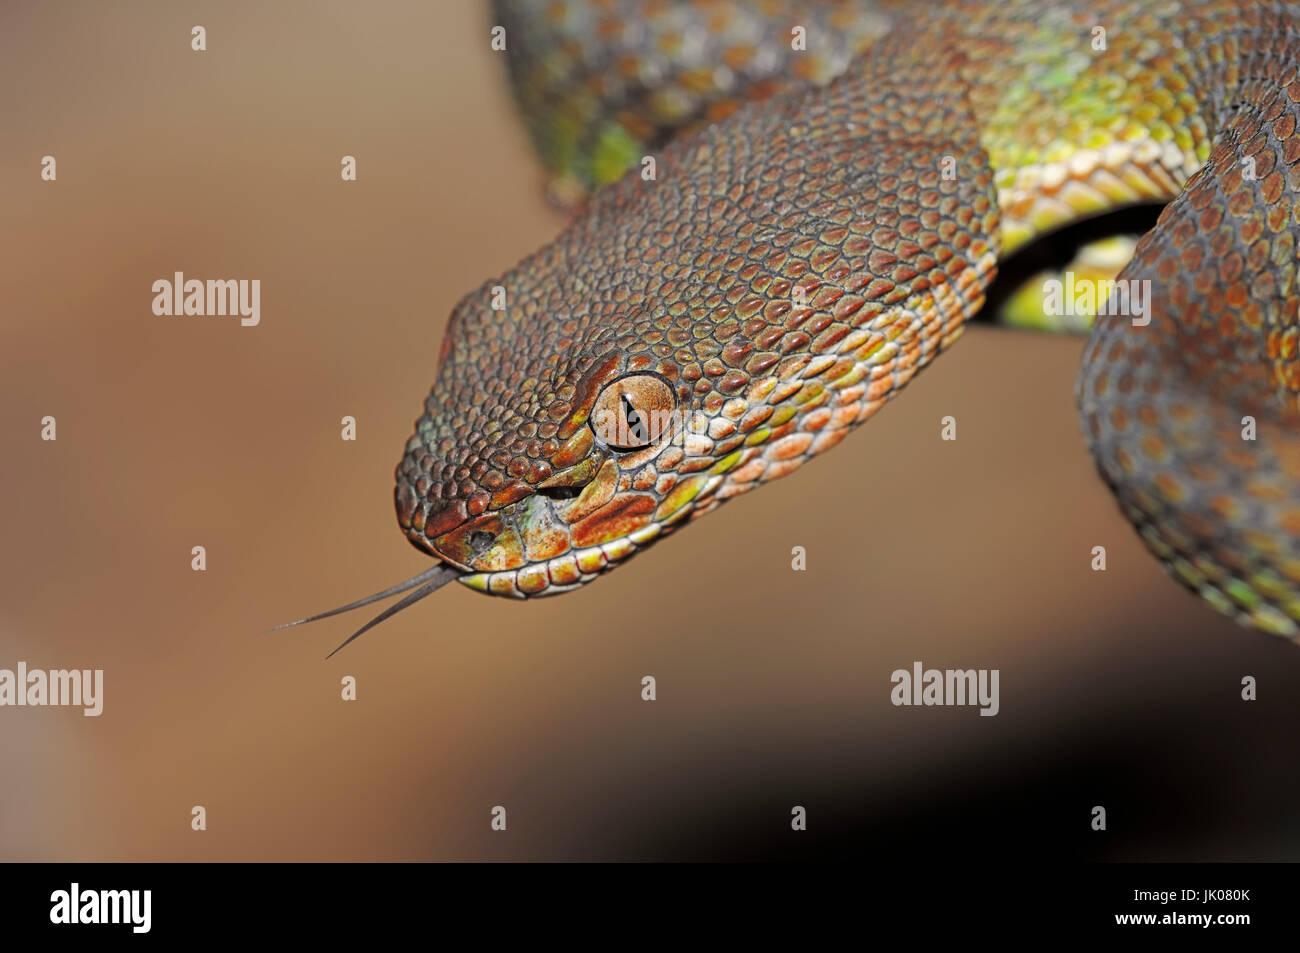 Bamboo Viper Flickering Its Tongue Trimeresurus Gramineus Stock